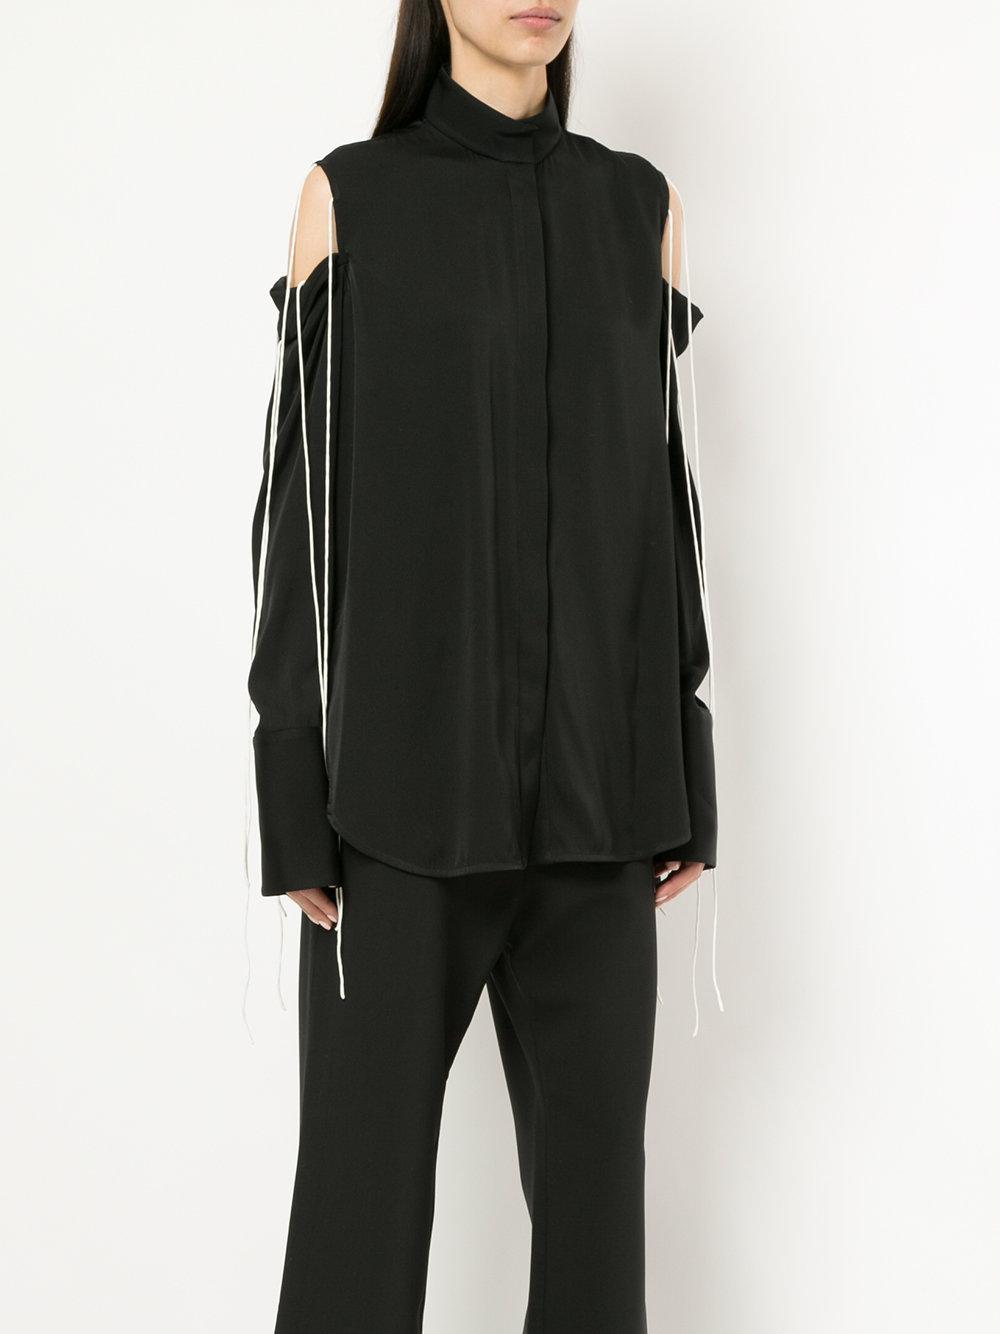 Ellery Silk Cut-out Shoulder Shirt in Black